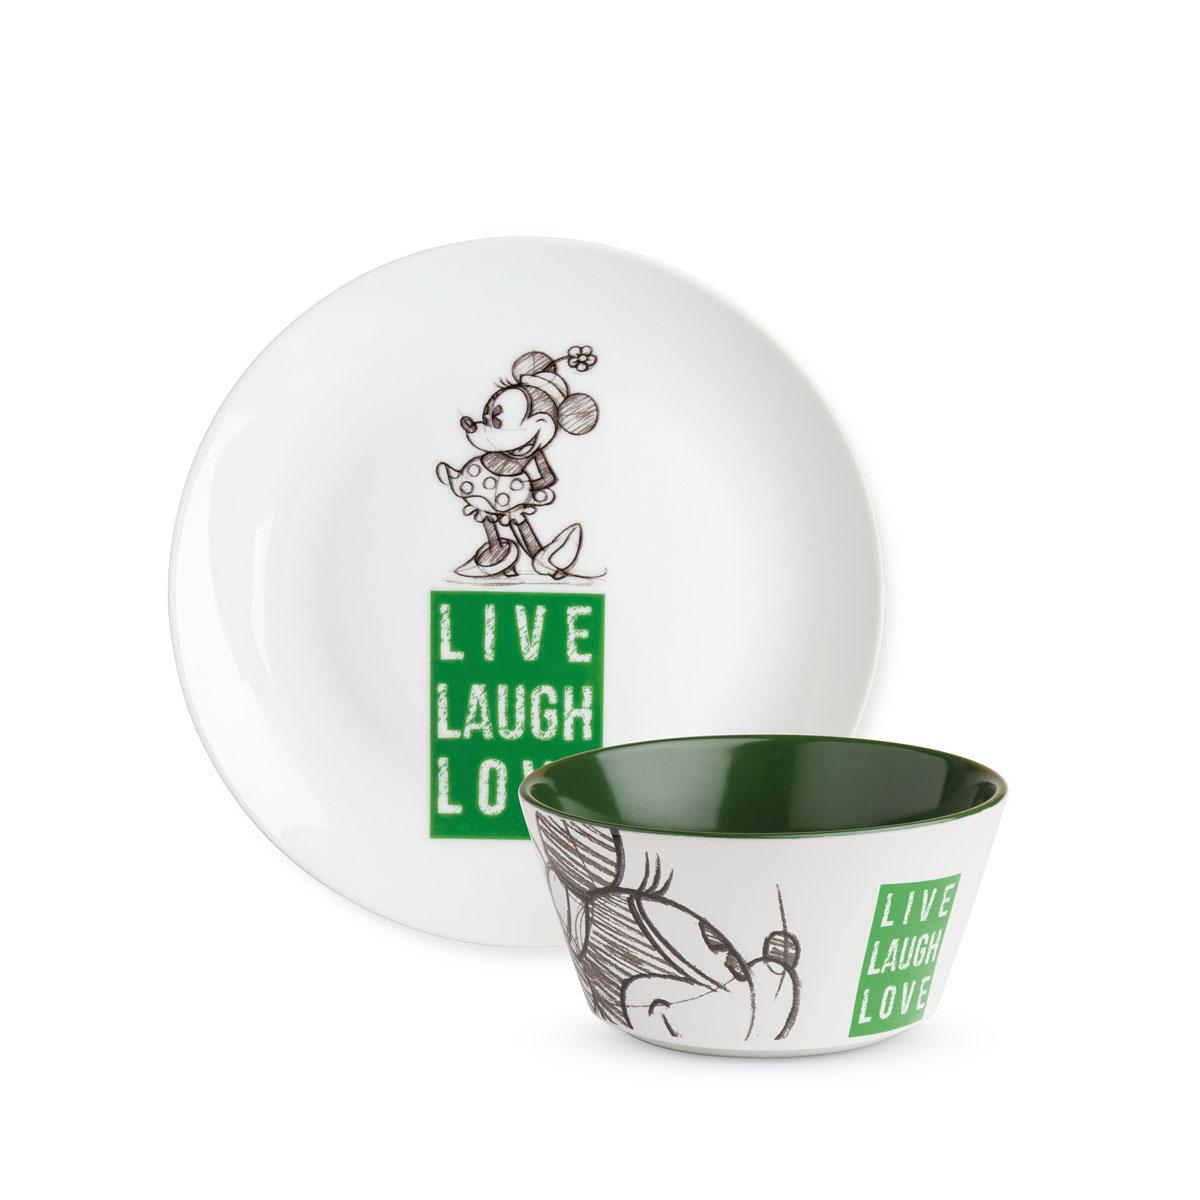 Minnie Plate/Bowl Green Set - Live Laugh Love